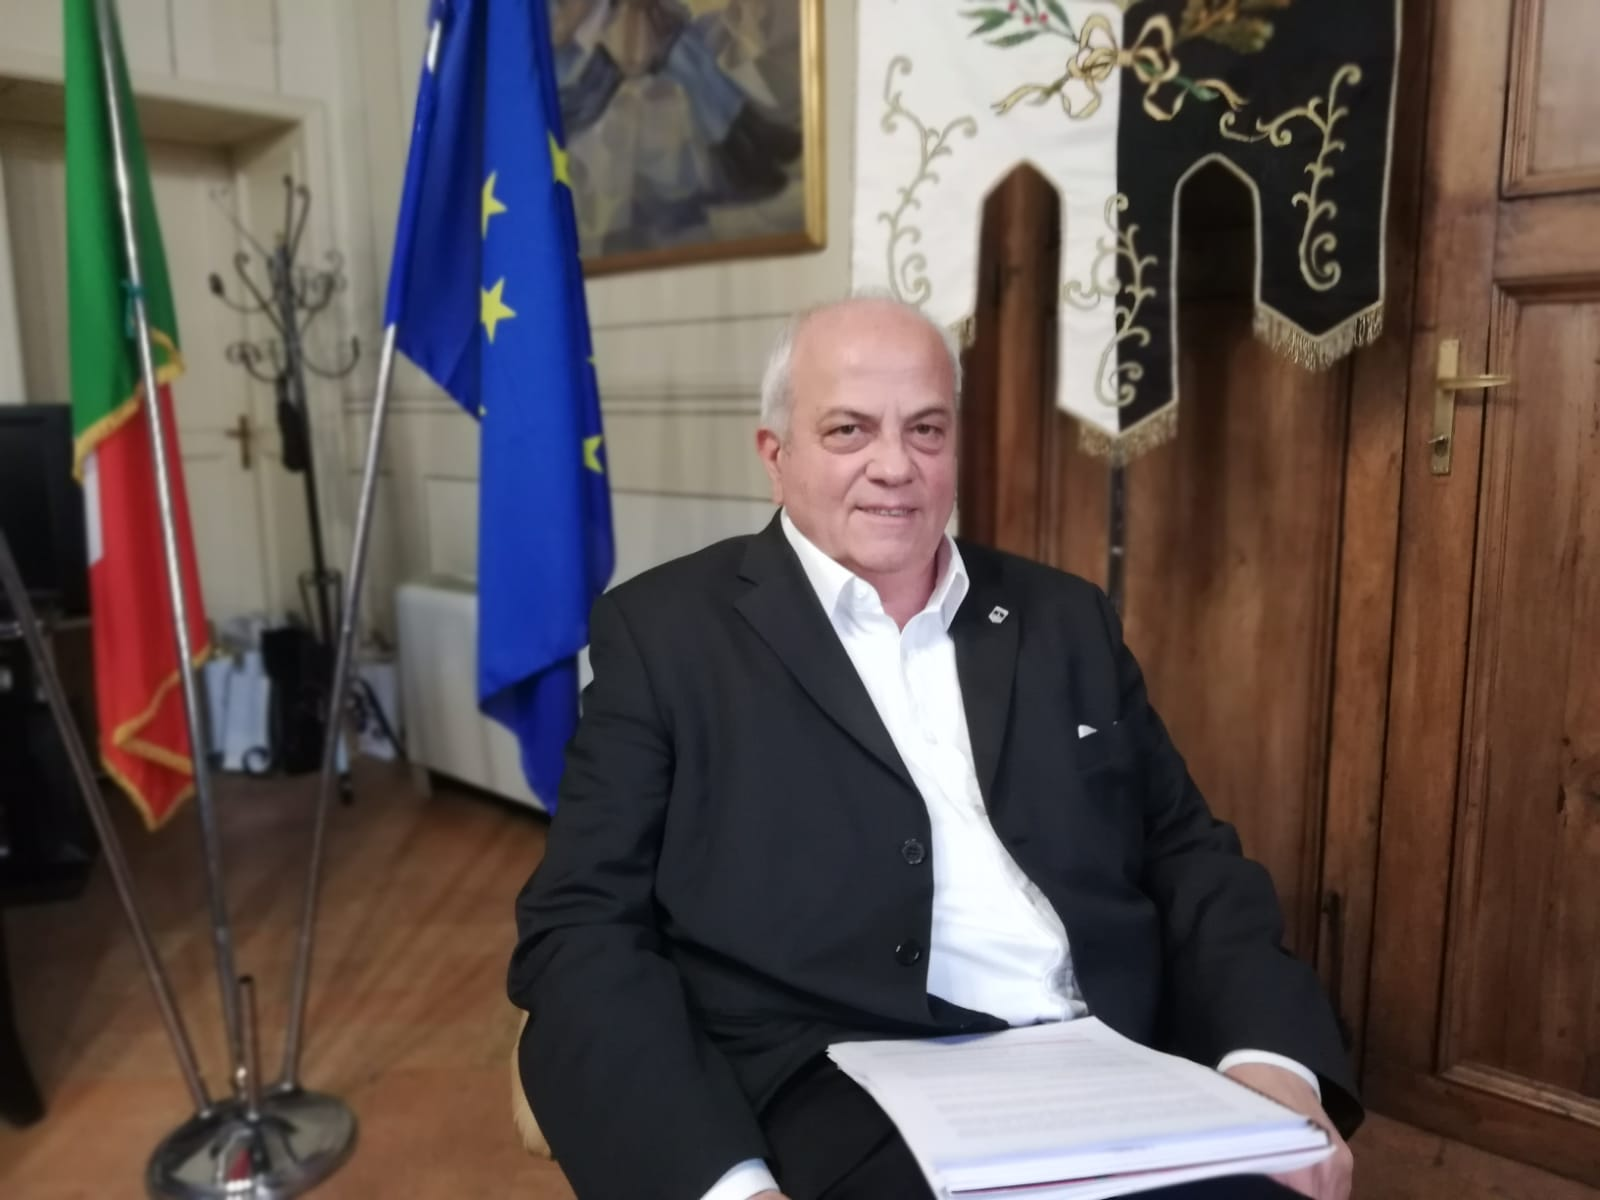 sansepolcro sindaco mauro cornioli